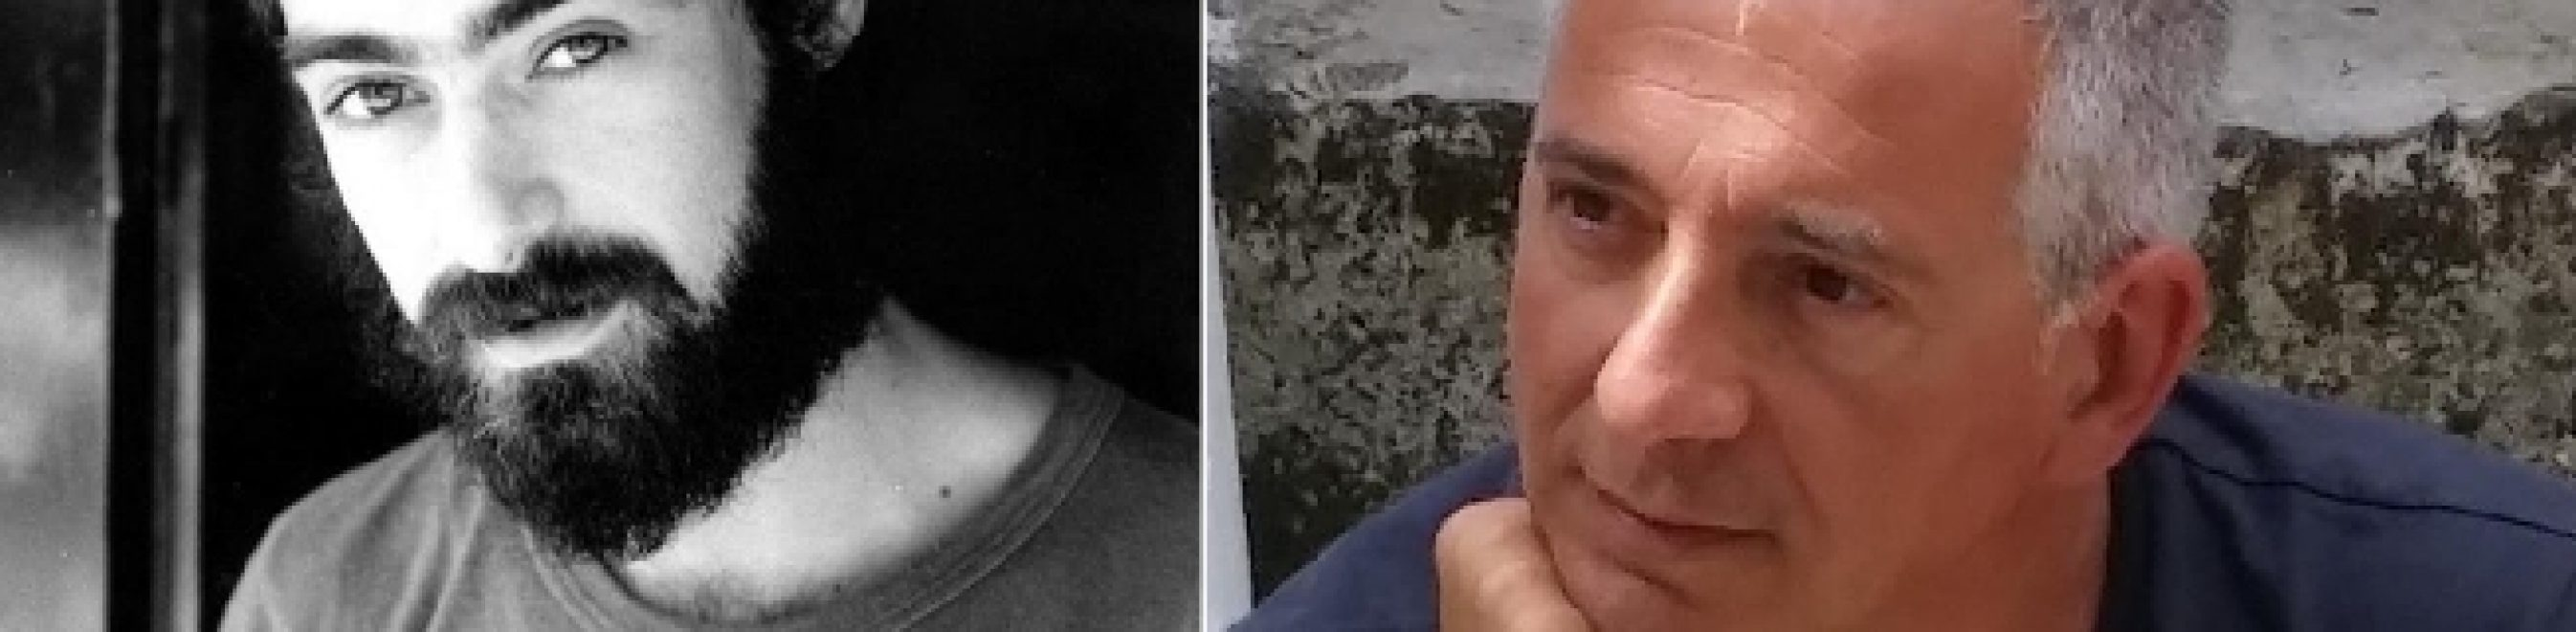 DARIO GAROFALO & CARLO PALESE